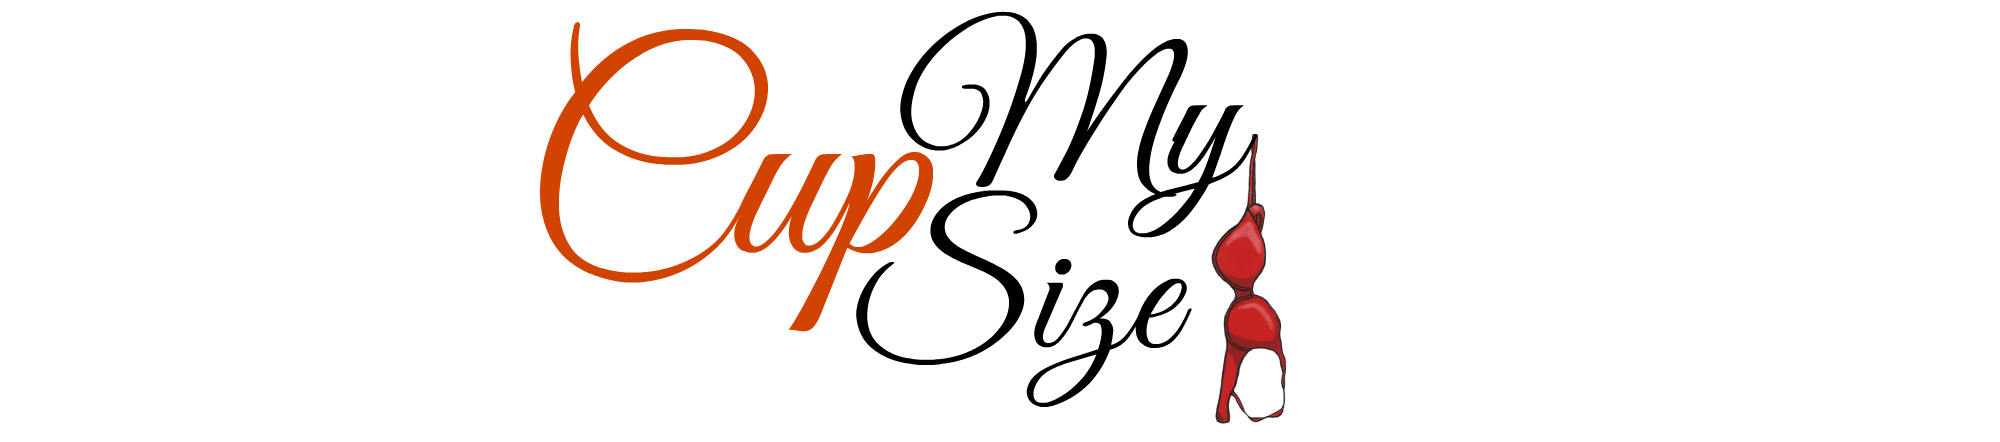 Cupmysize